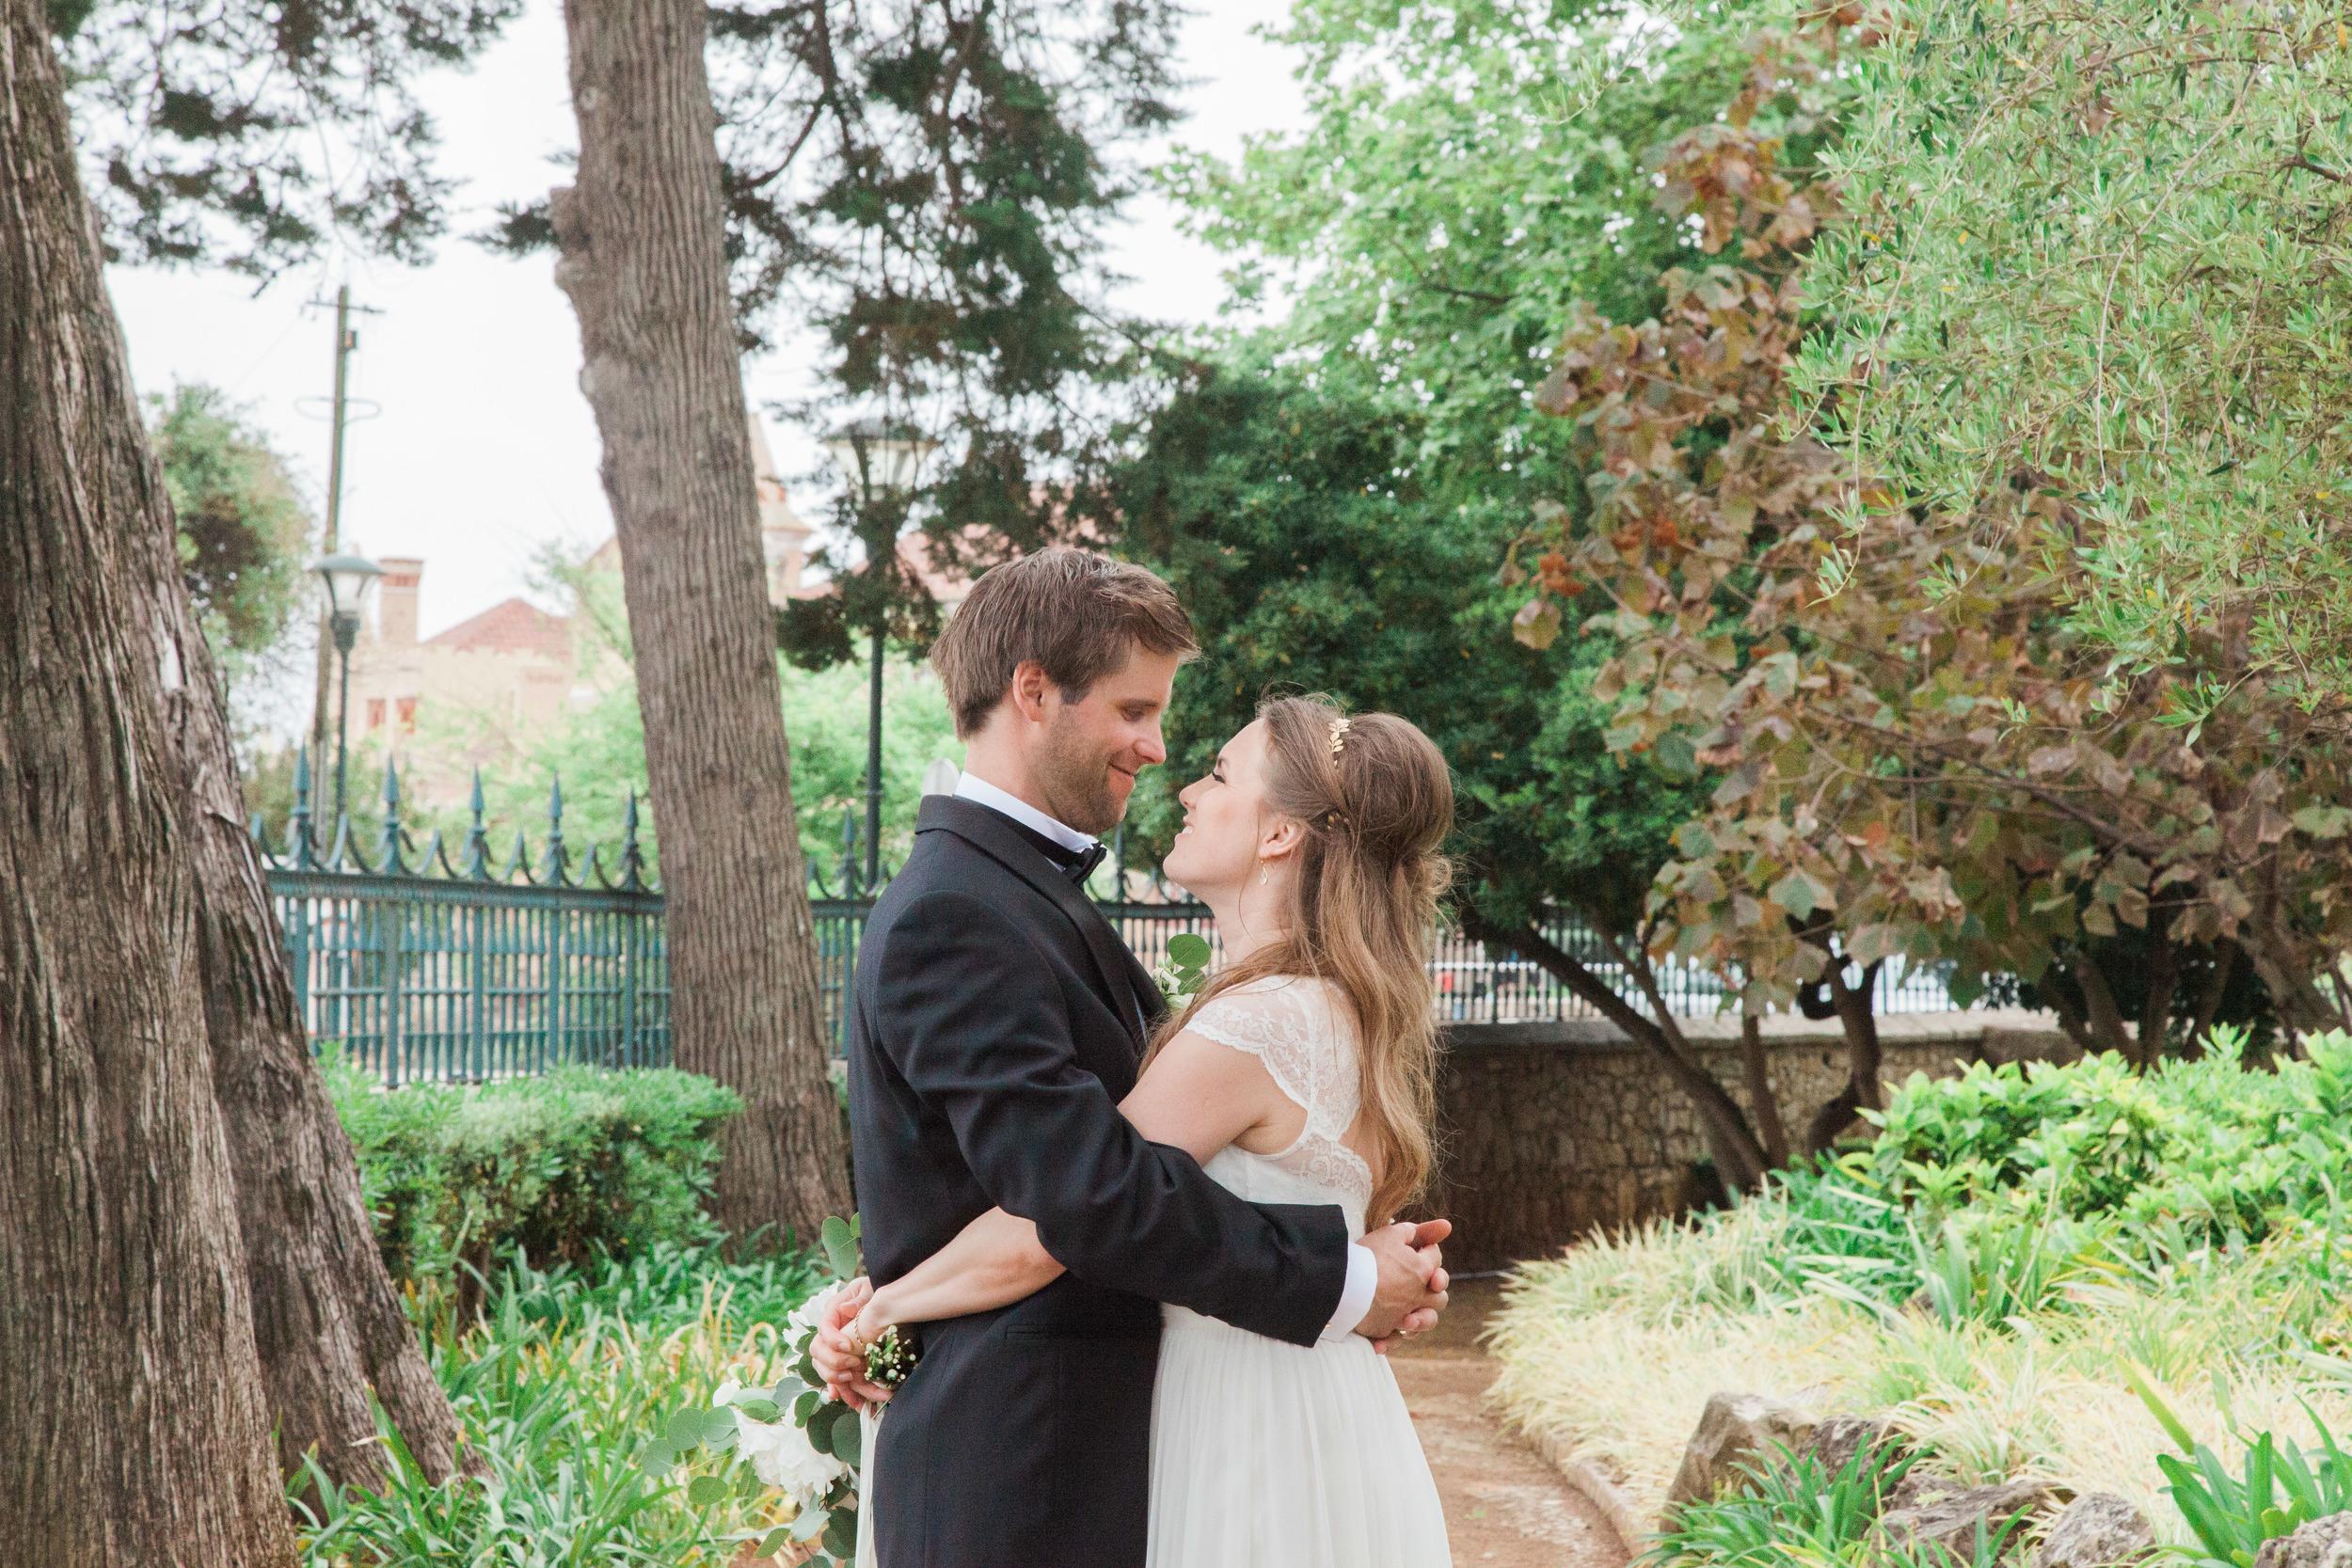 mariarao+wedding+portugal+cascais-437.jpg